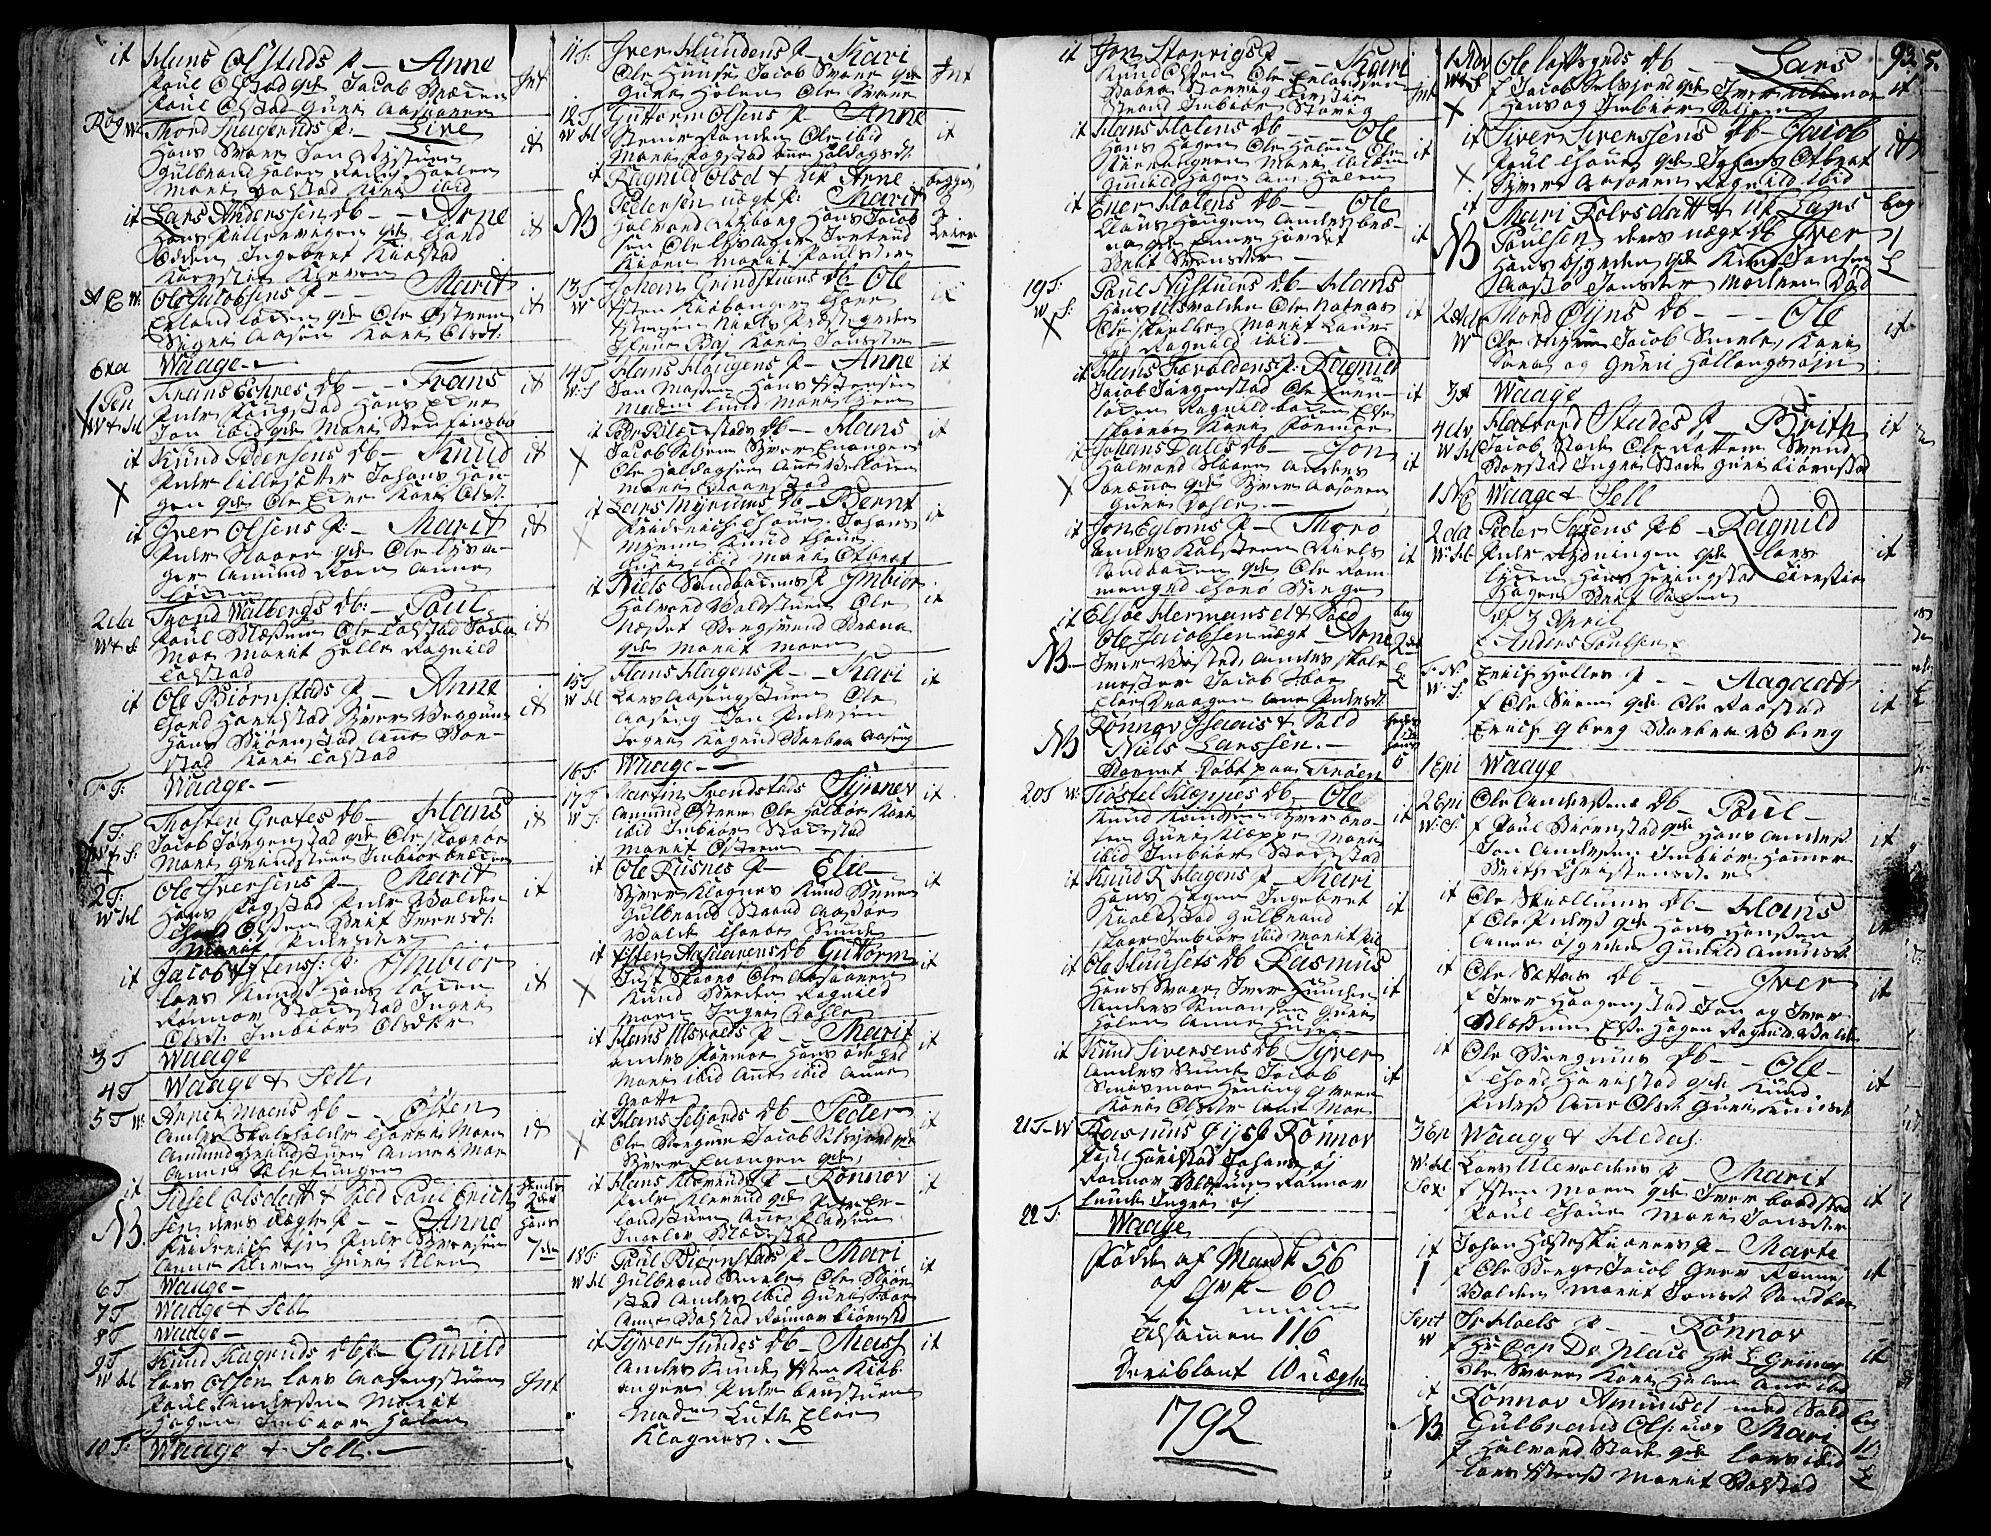 SAH, Vågå prestekontor, Ministerialbok nr. 1, 1739-1810, s. 93